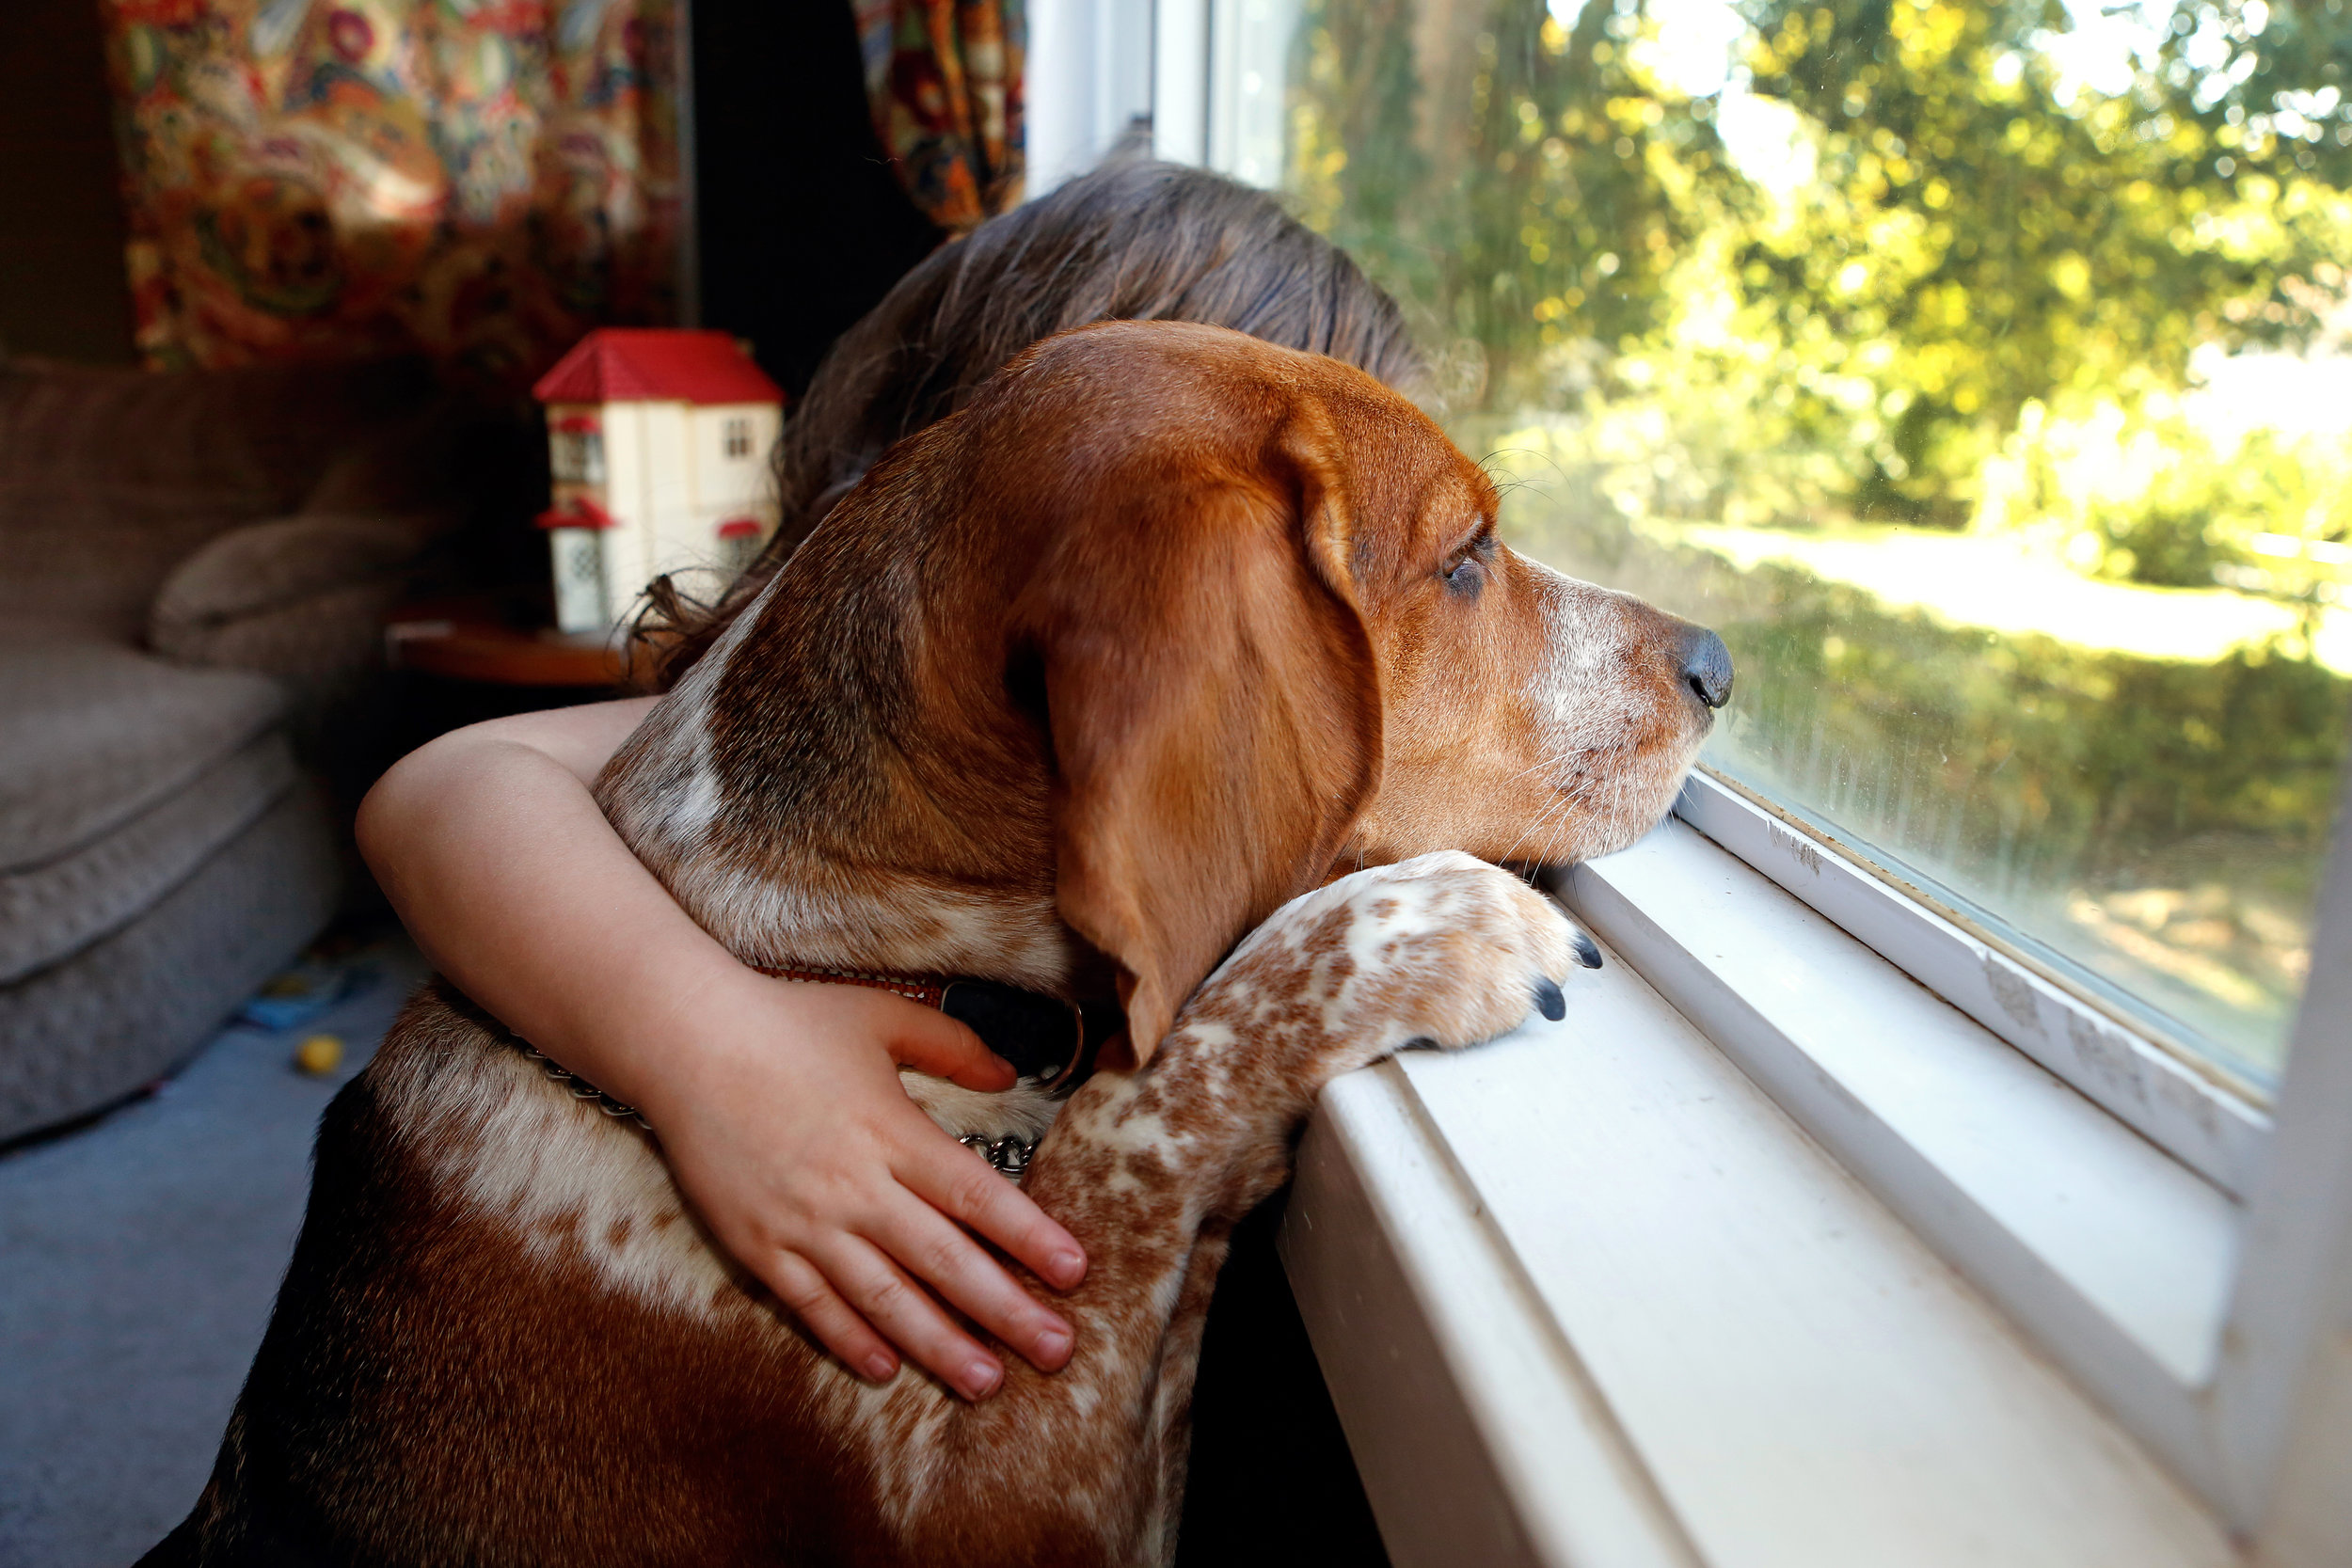 Dog_companion.jpg